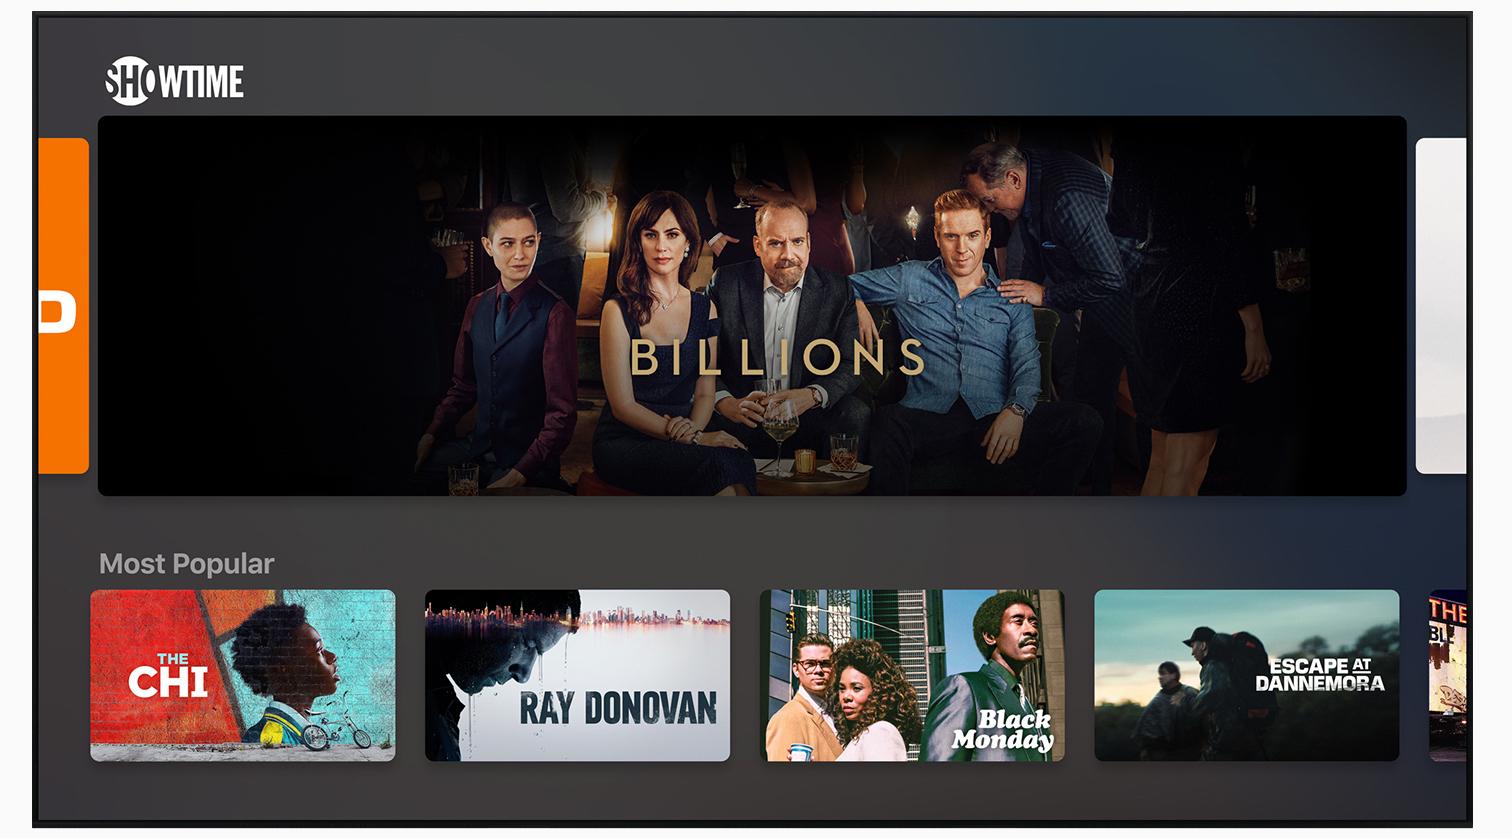 https://www.macfreak.nl/modules/news/images/zArt.Apple_TV_app_shows-screen_032519.jpg